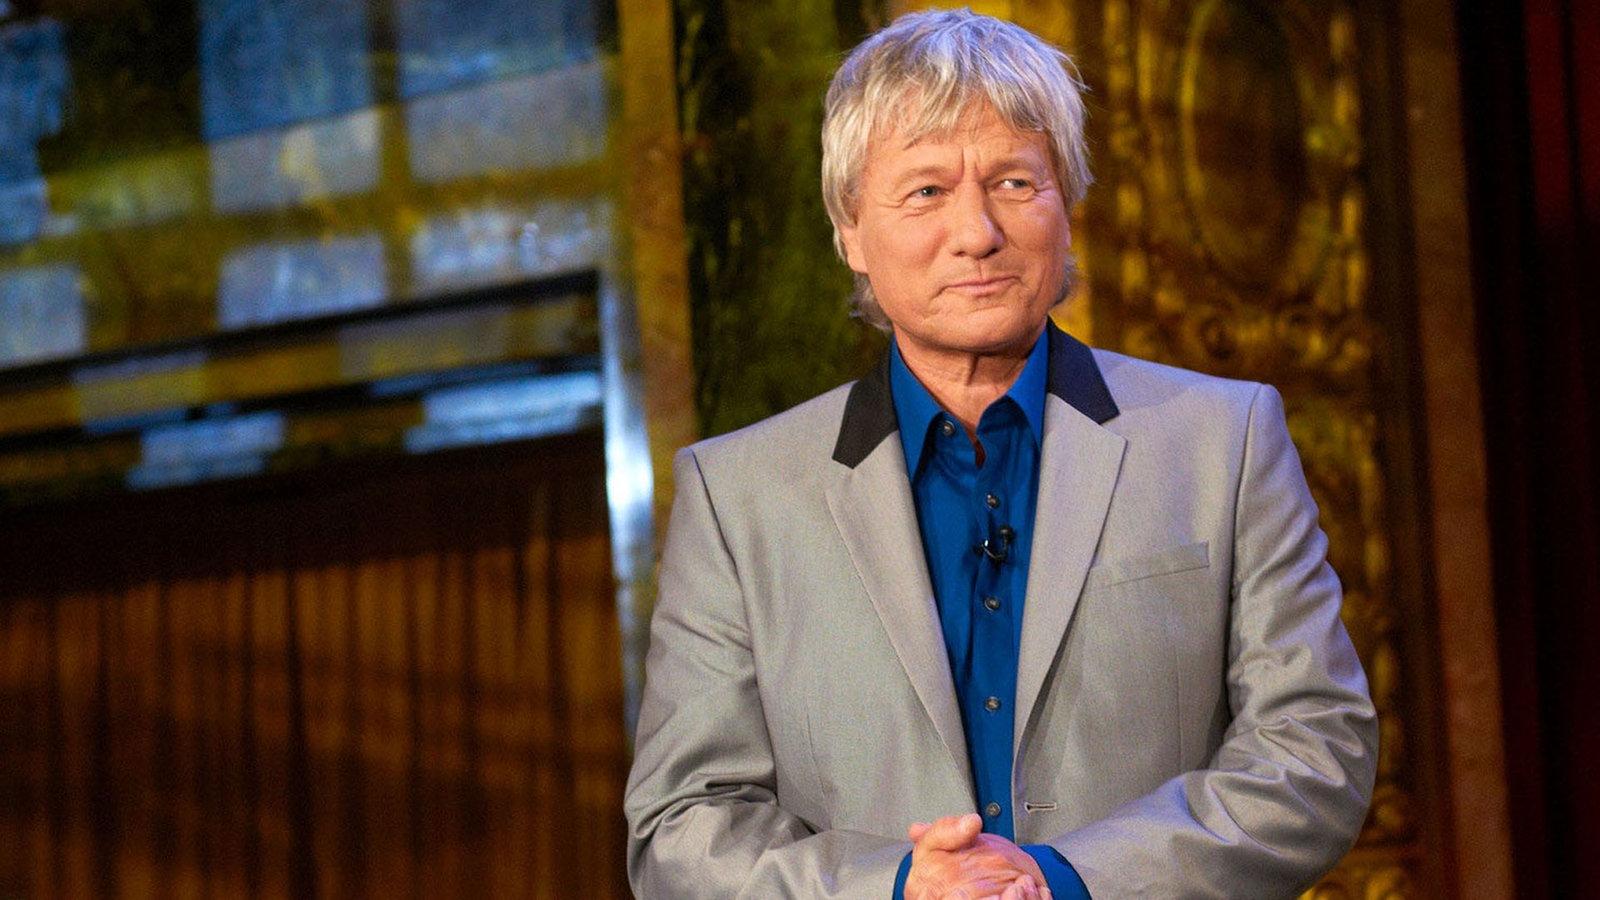 Kabarettist Jurgen Becker Kolner Treff Sendungen A Z Video Mediathek Wdr